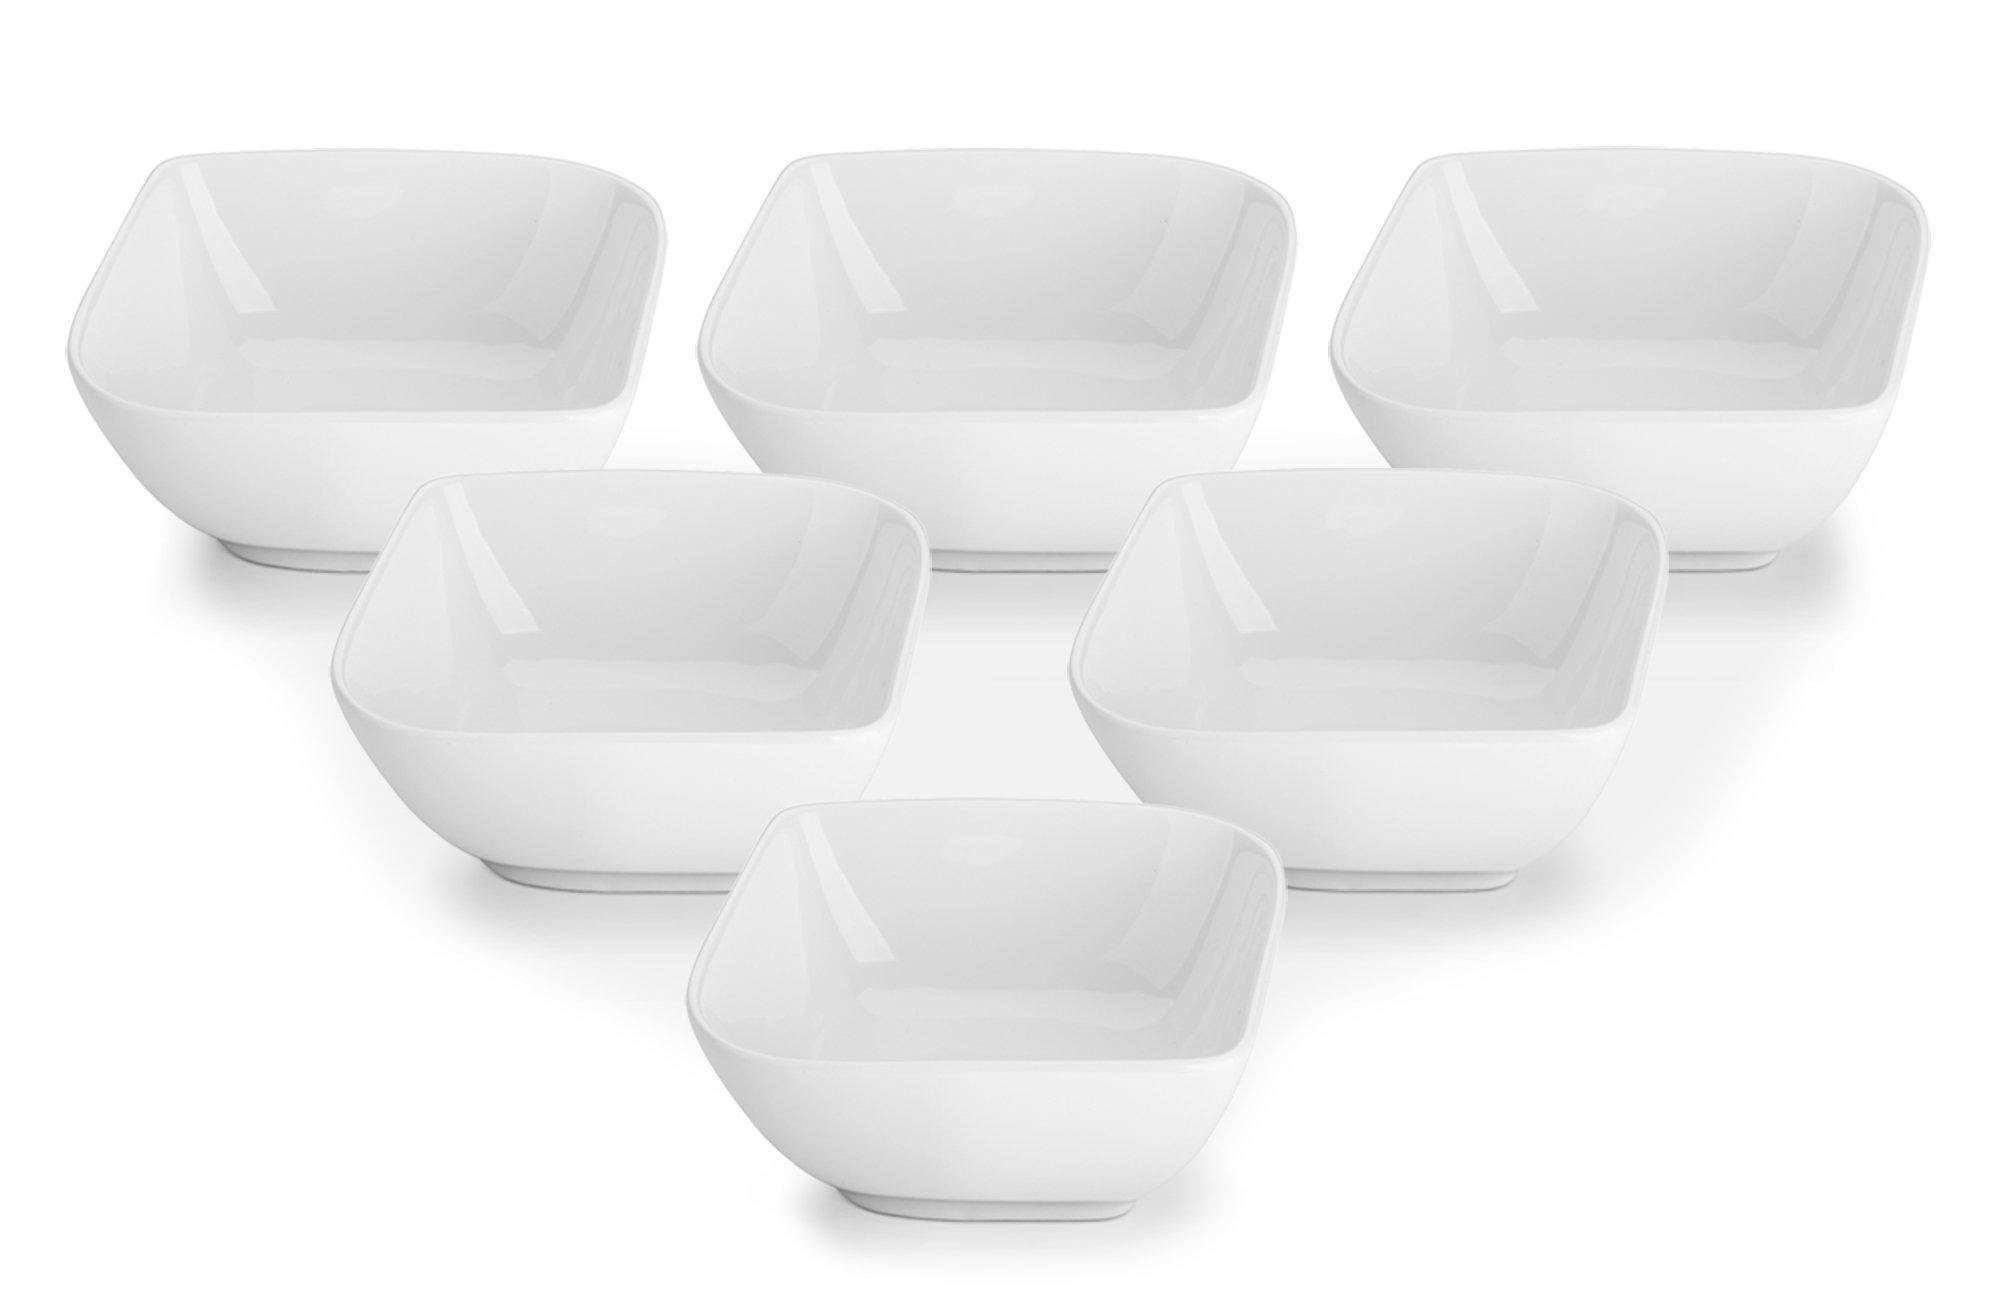 DOWAN 8oz Porcelain Ramekins/Dessert Bowls- Set of 6, White, Stylish Square